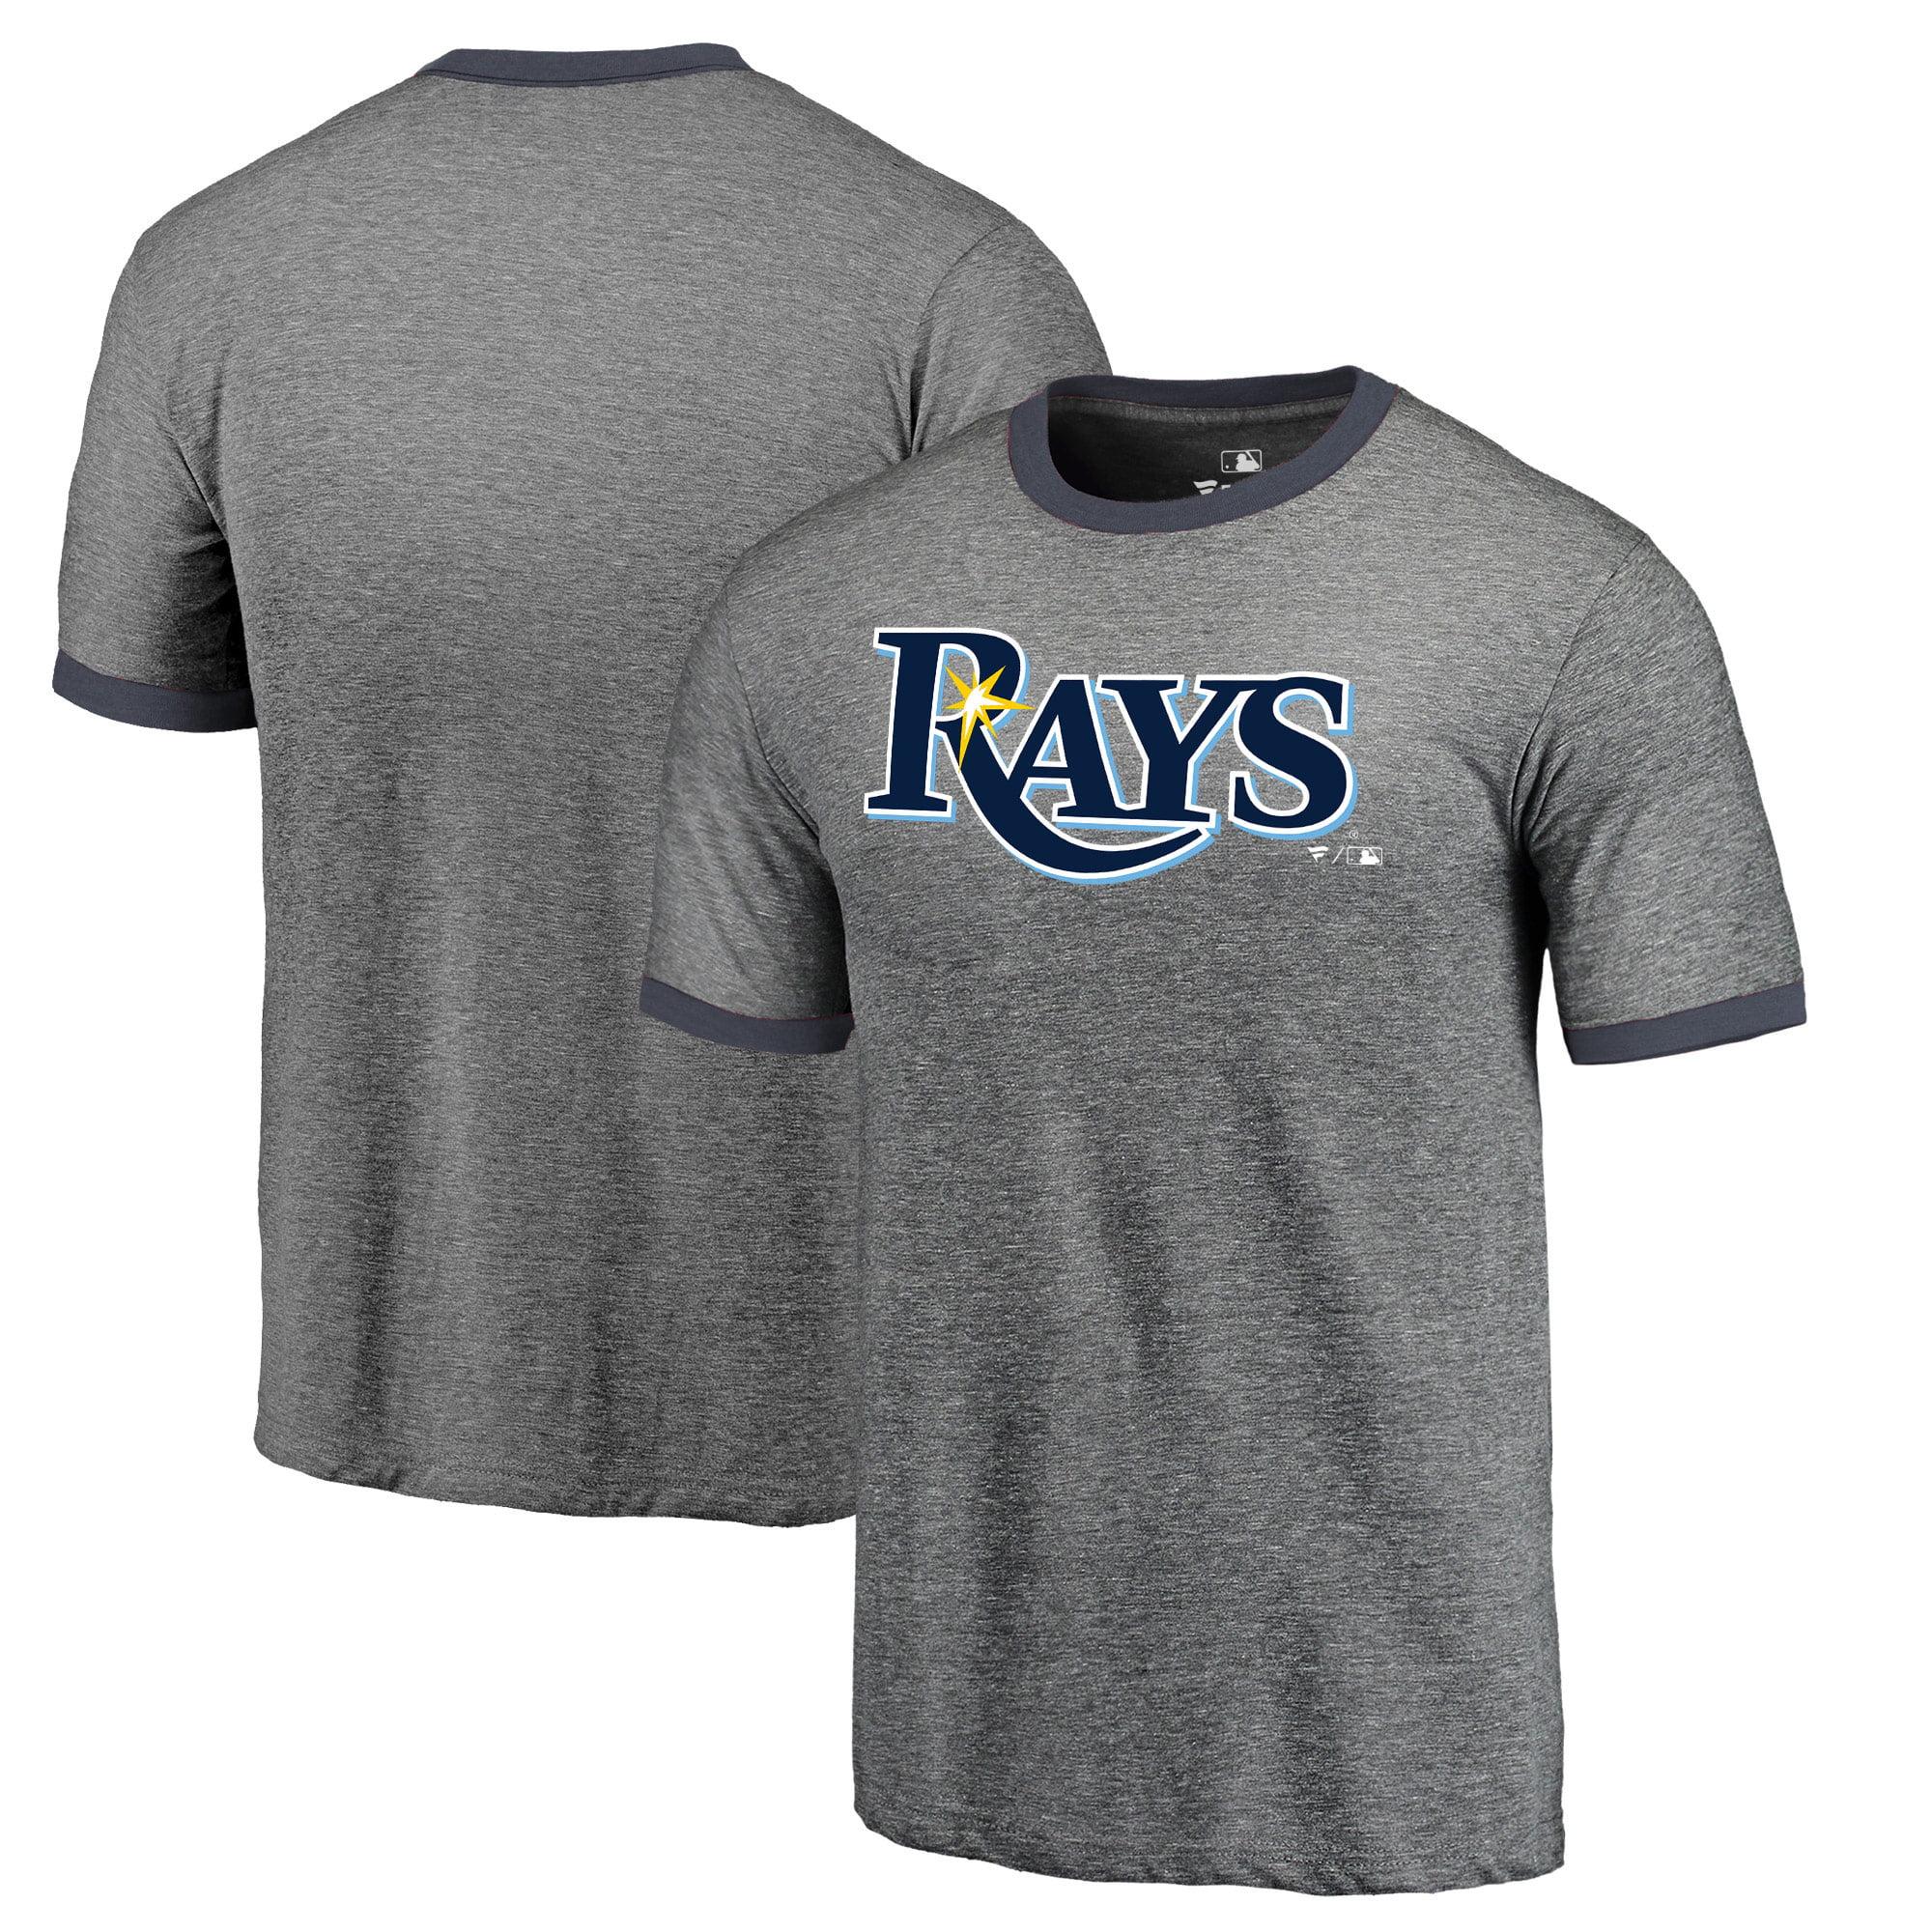 Tampa Bay Rays Fanatics Branded Refresh Ringer Team Wordmark T-Shirt - Heathered Gray